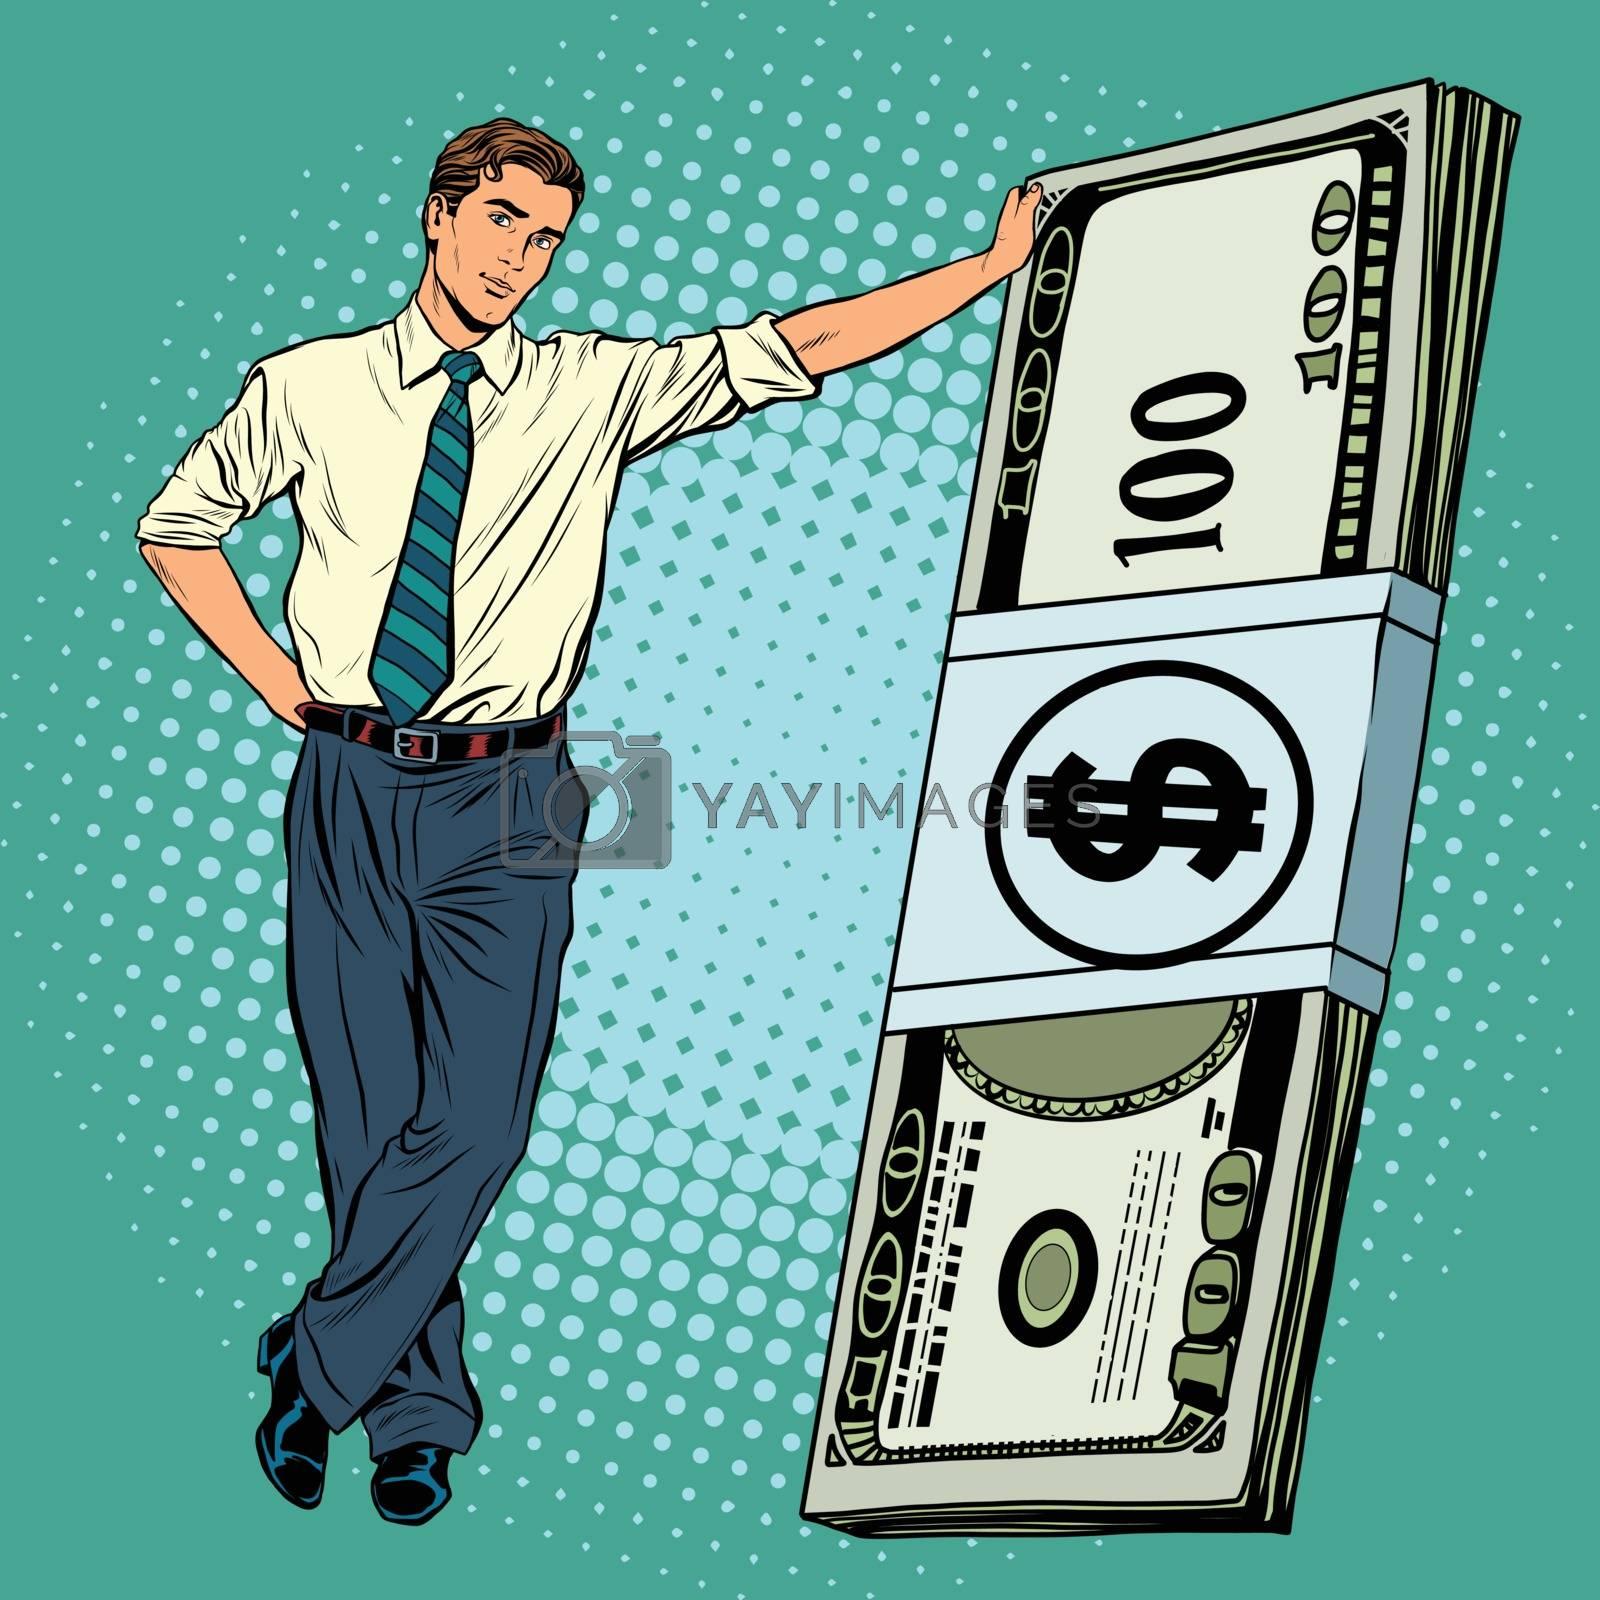 Business man with money pop art retro vector. Financial success